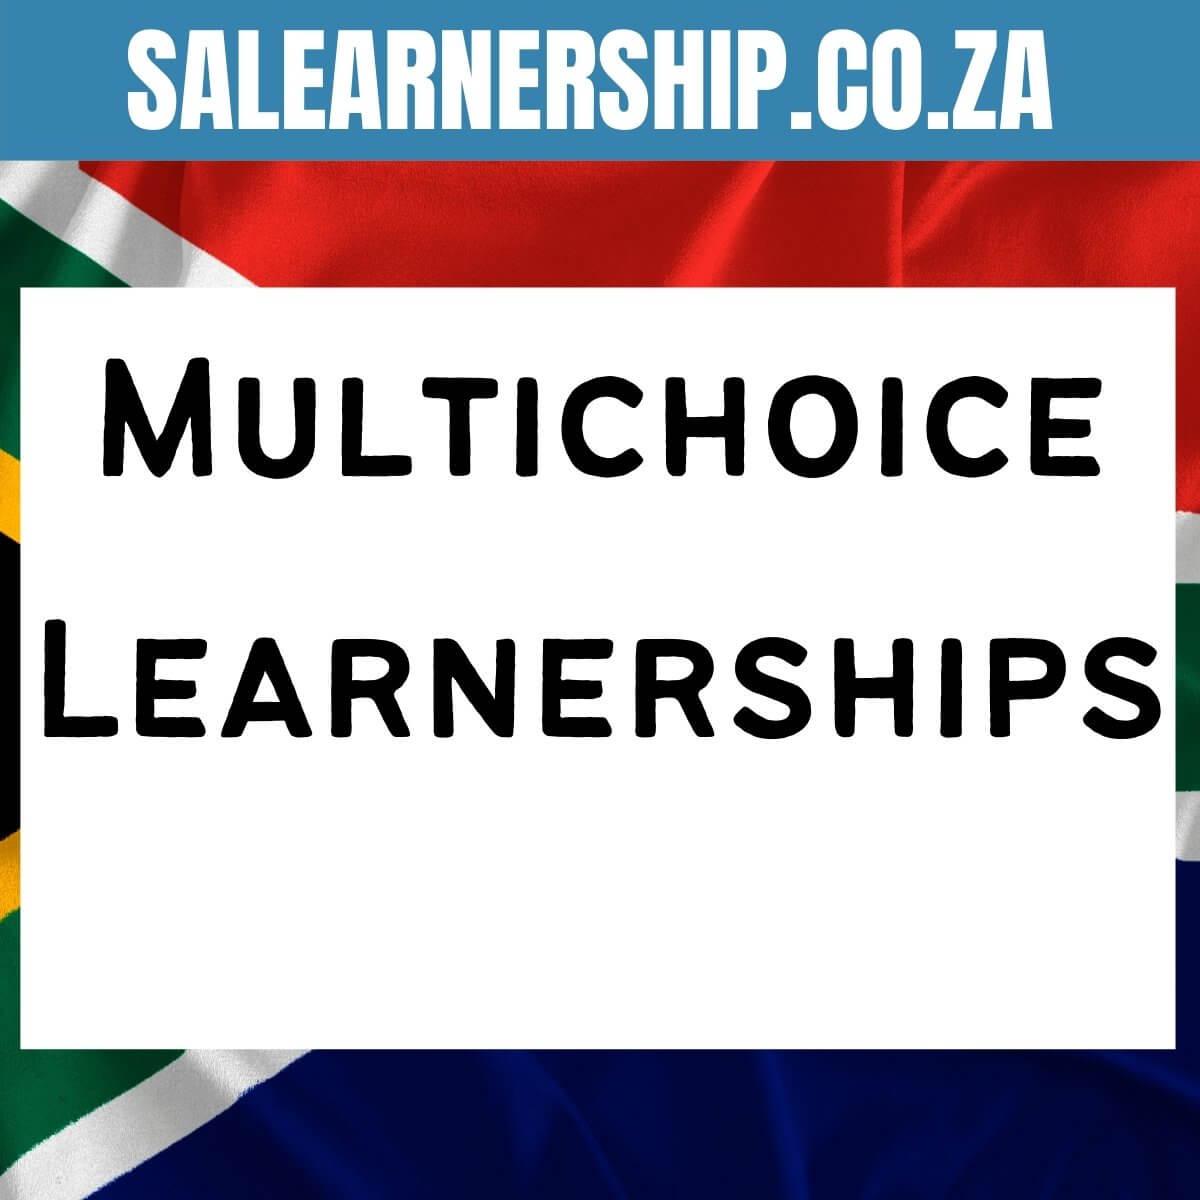 Multichoice Learnerships